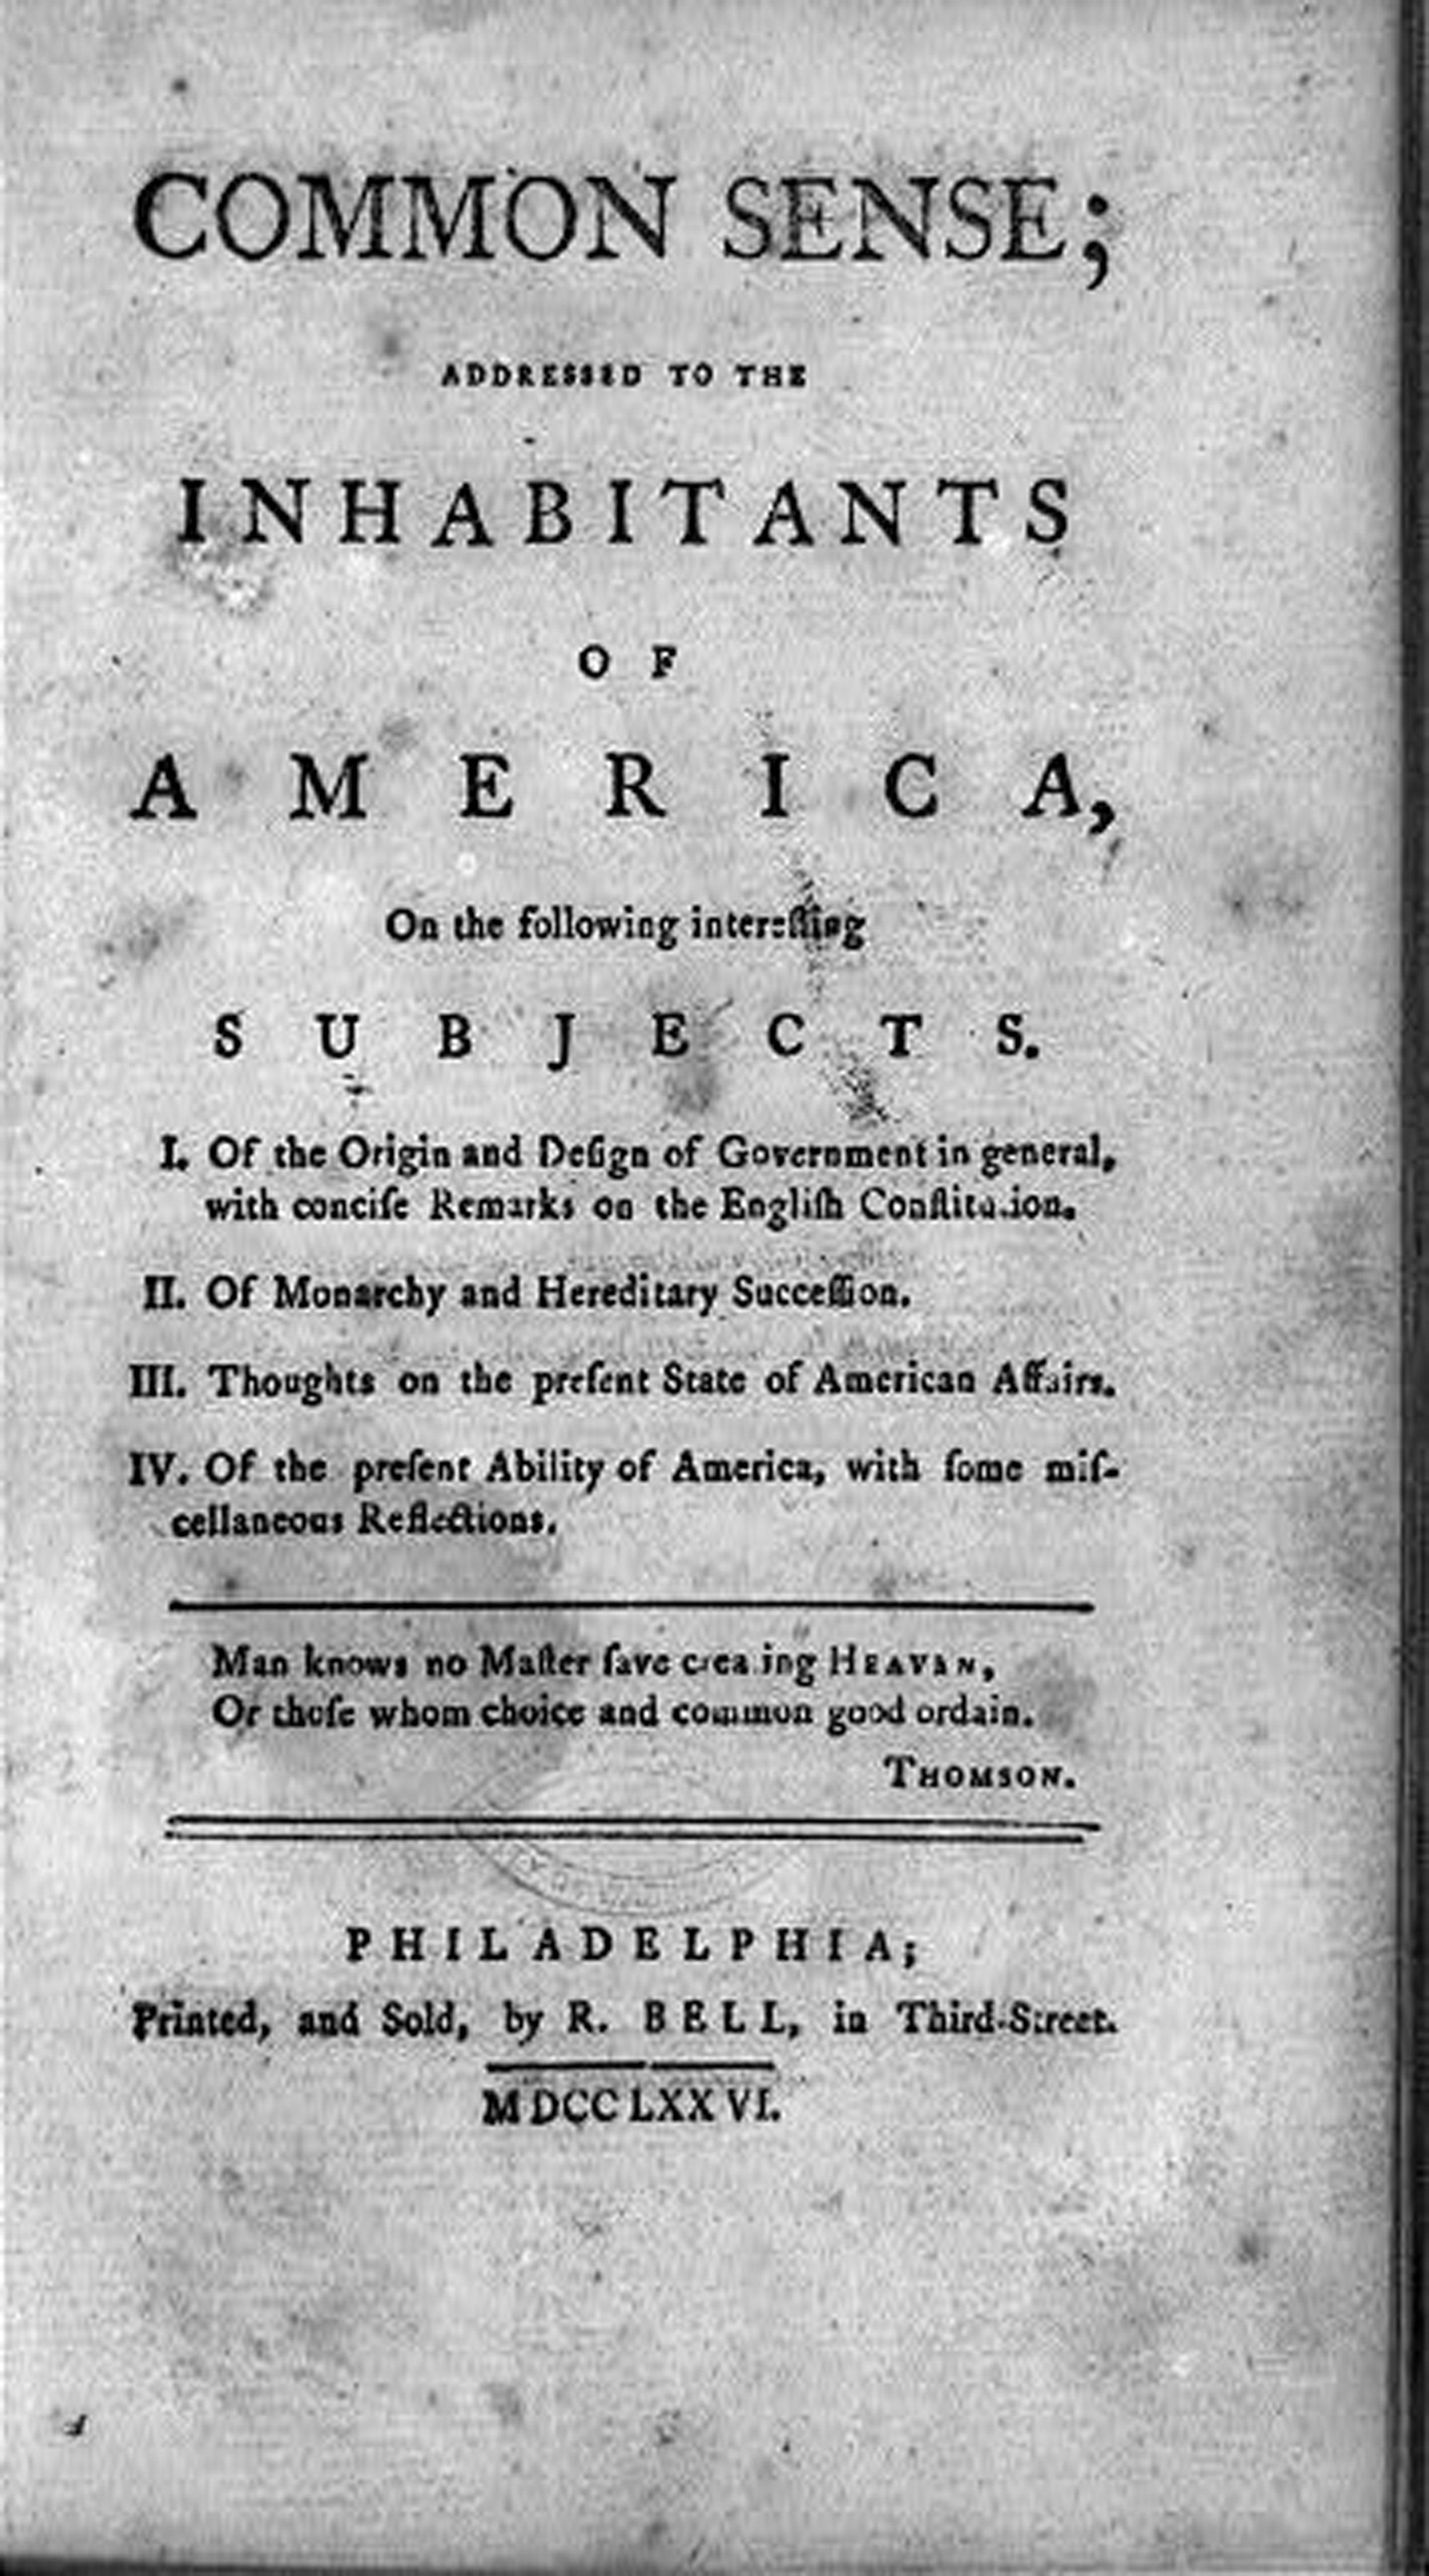 Books And The Development Of U S Popular Culture